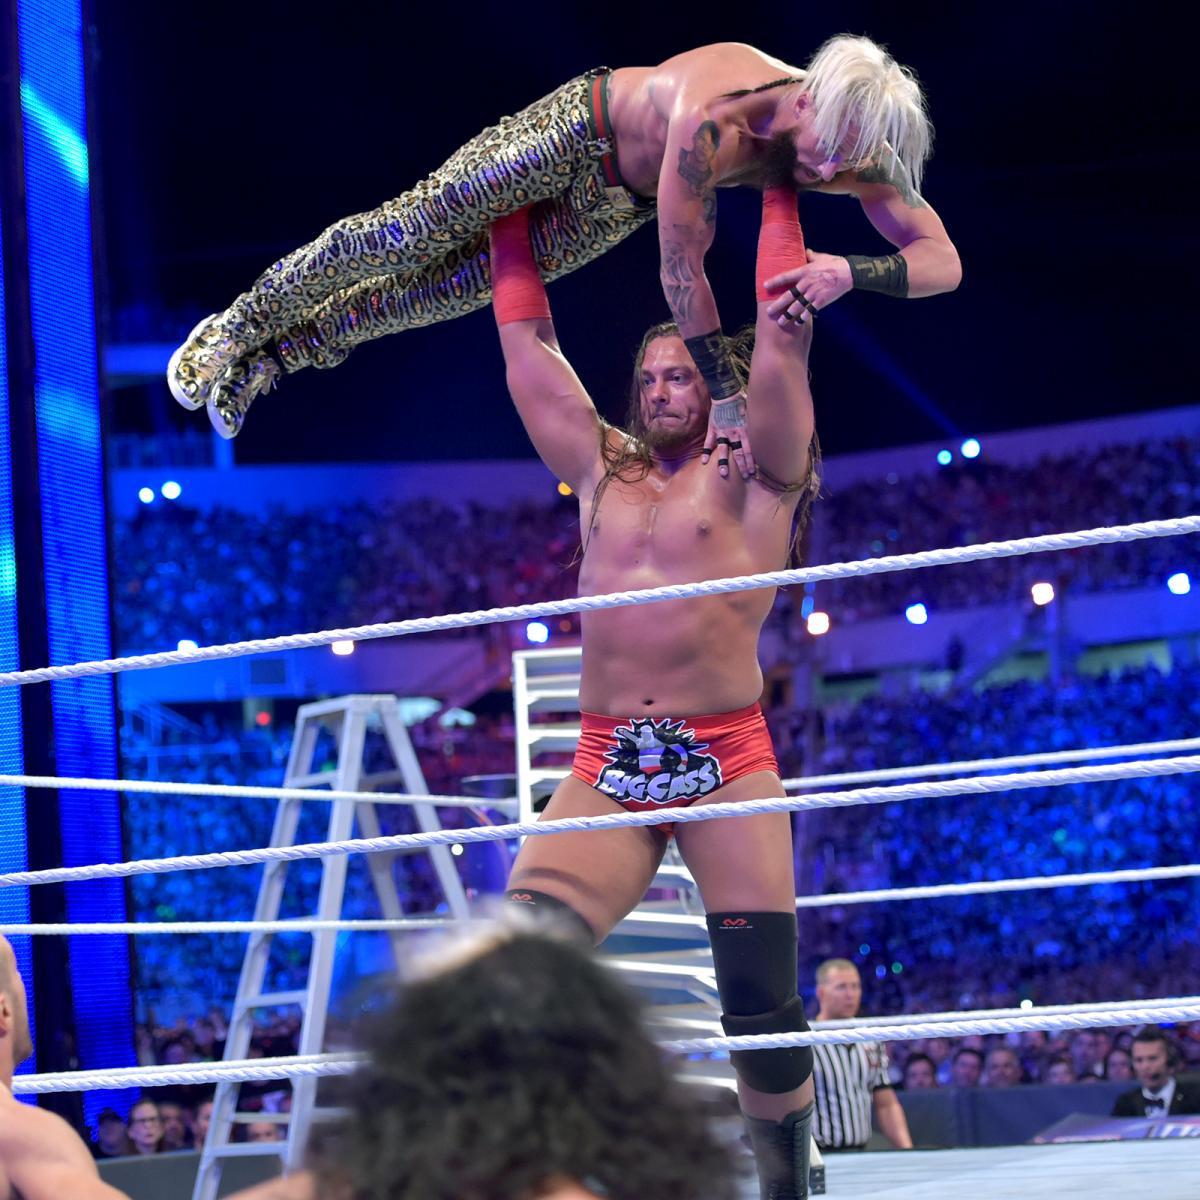 WWE-Kicks-Wrestlemania-33-Enzo-Amore-1.jpg